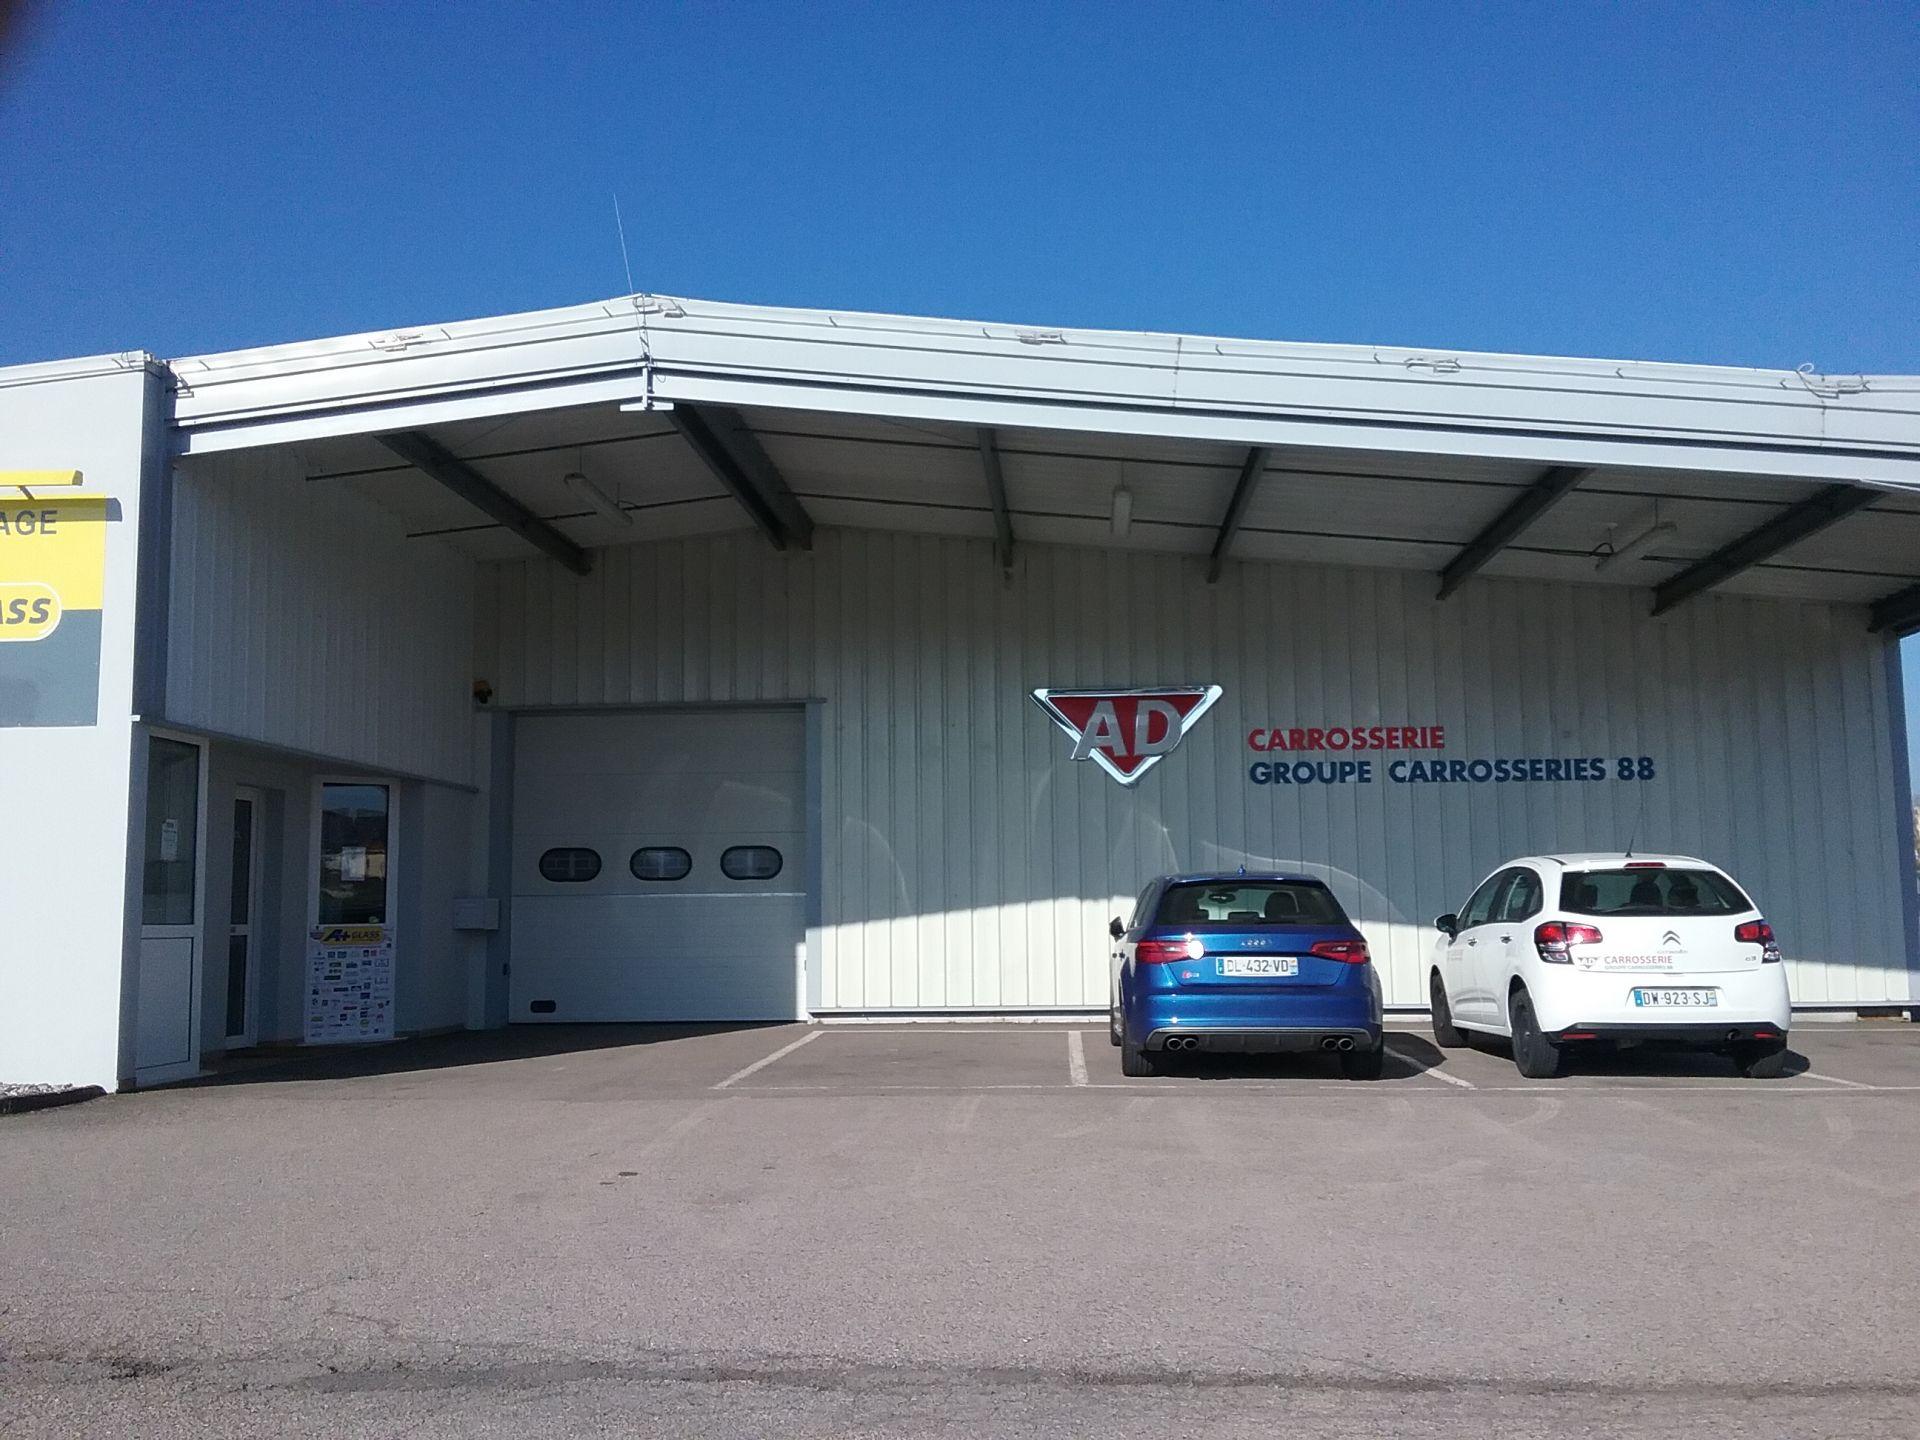 Garage ad carosserie remy lorraine tourisme for Garage ad la bresse